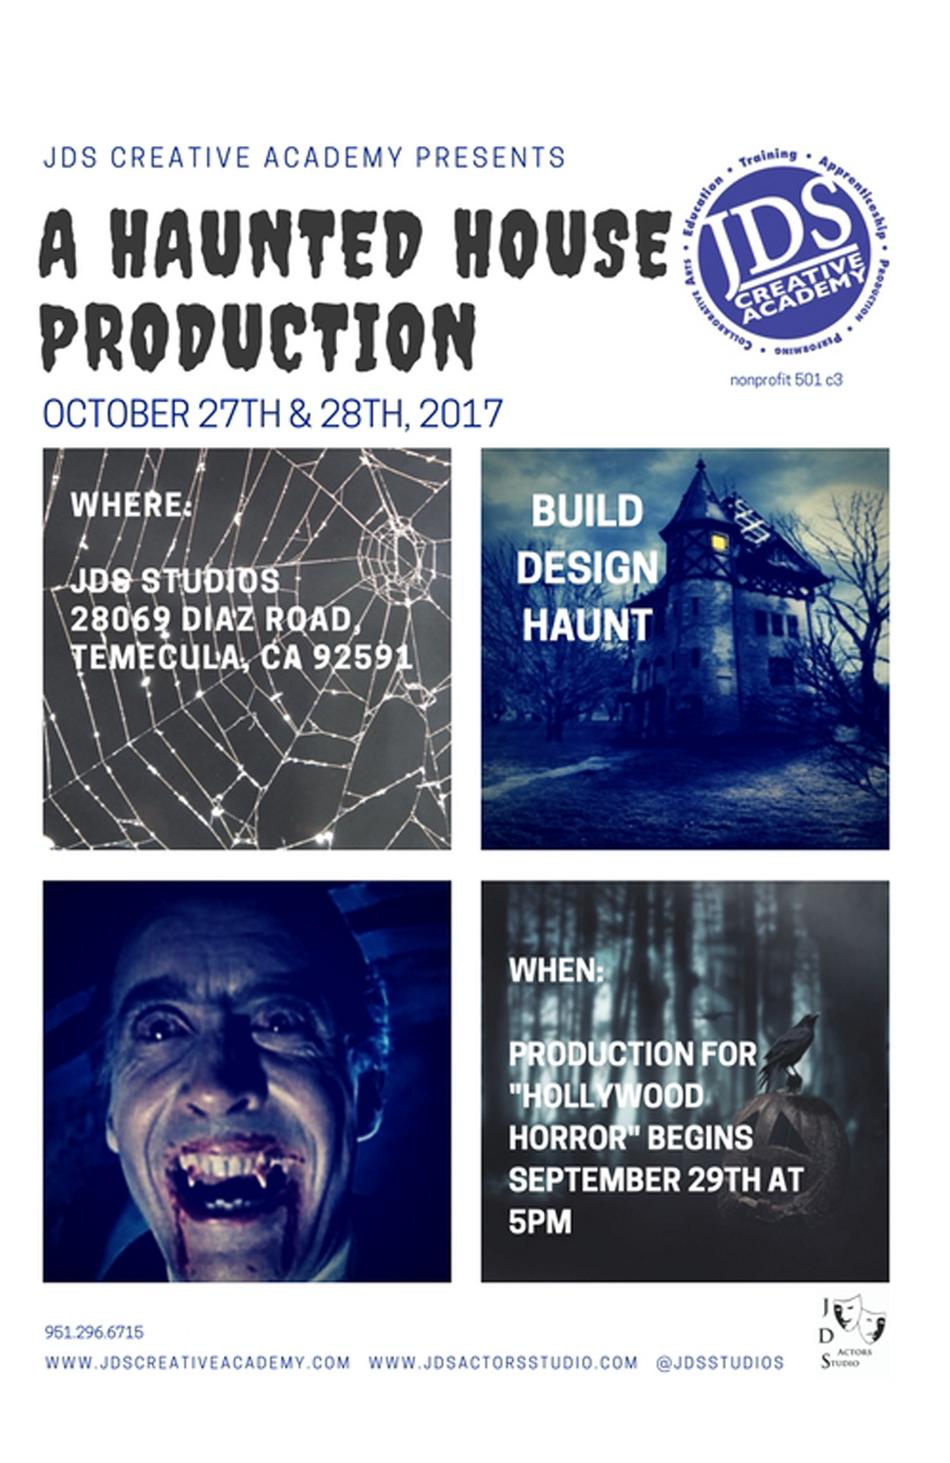 JDSCA Haunted House 2017